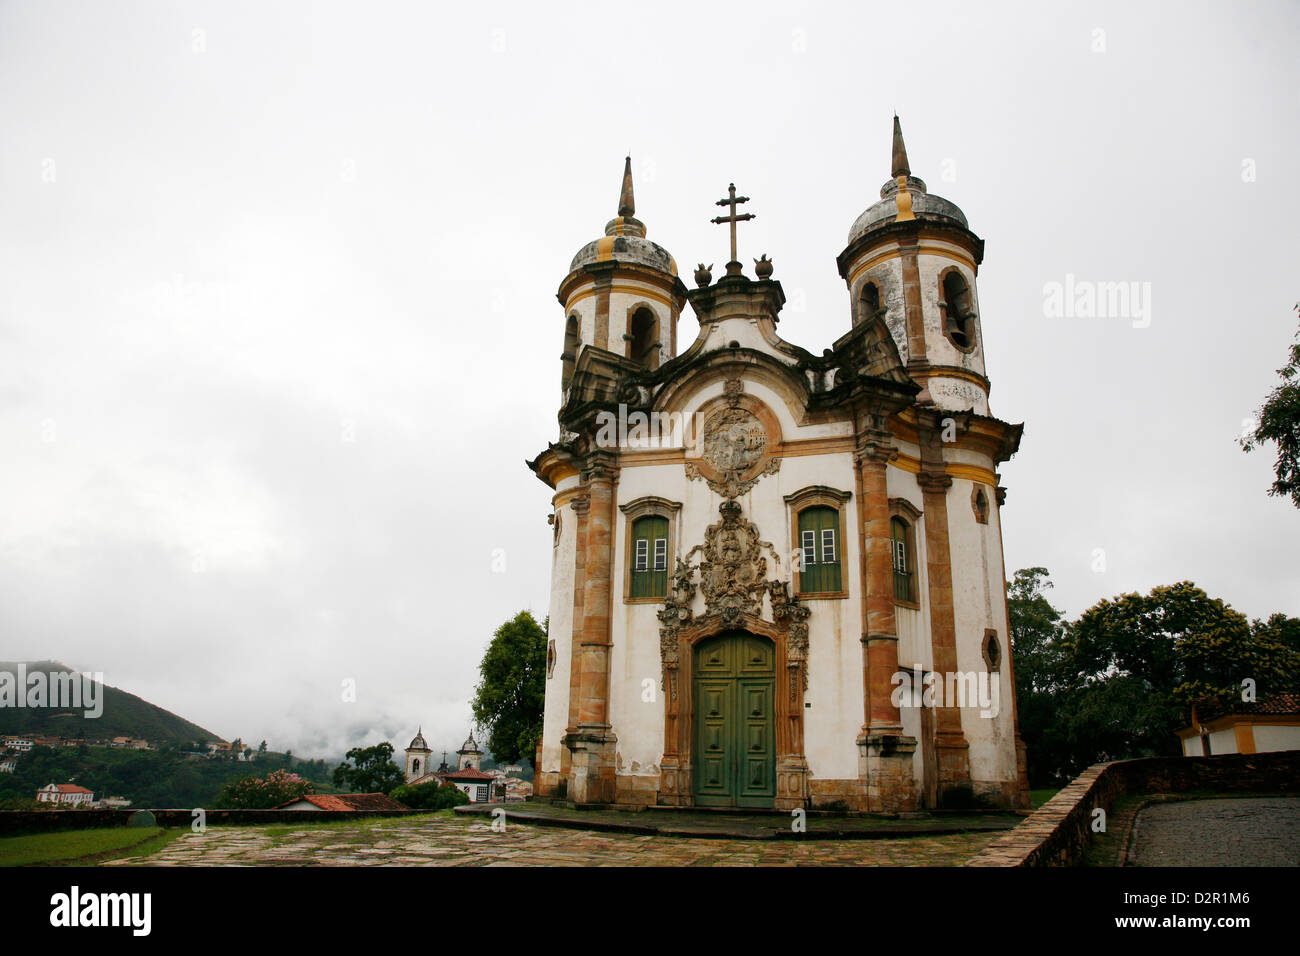 Sao Francisco de Assis church, Ouro Preto, UNESCO World Heritage Site, Minas Gerais, Brazil, South America Stock Photo